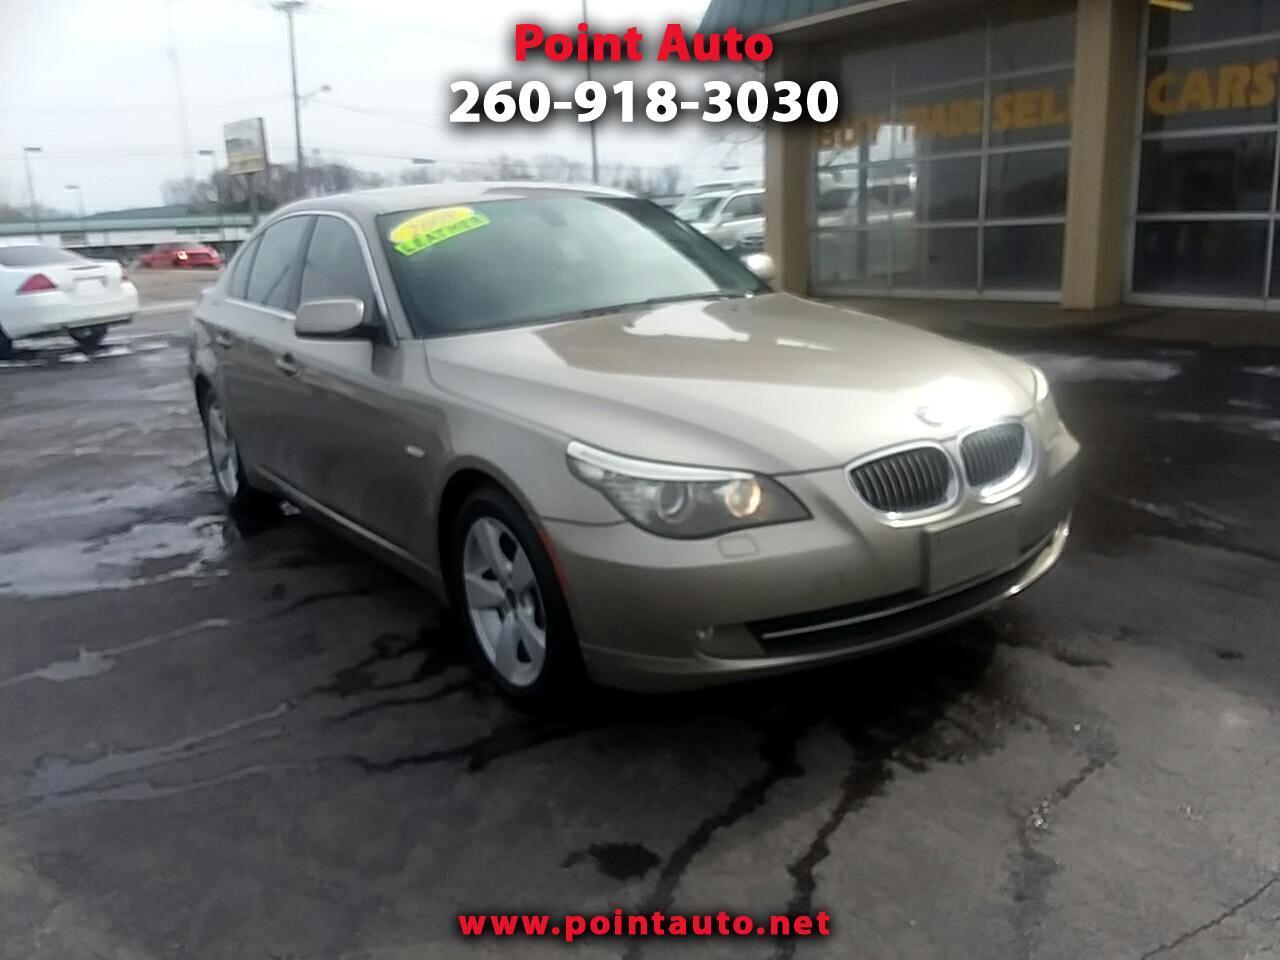 2008 BMW 5-Series 528xi